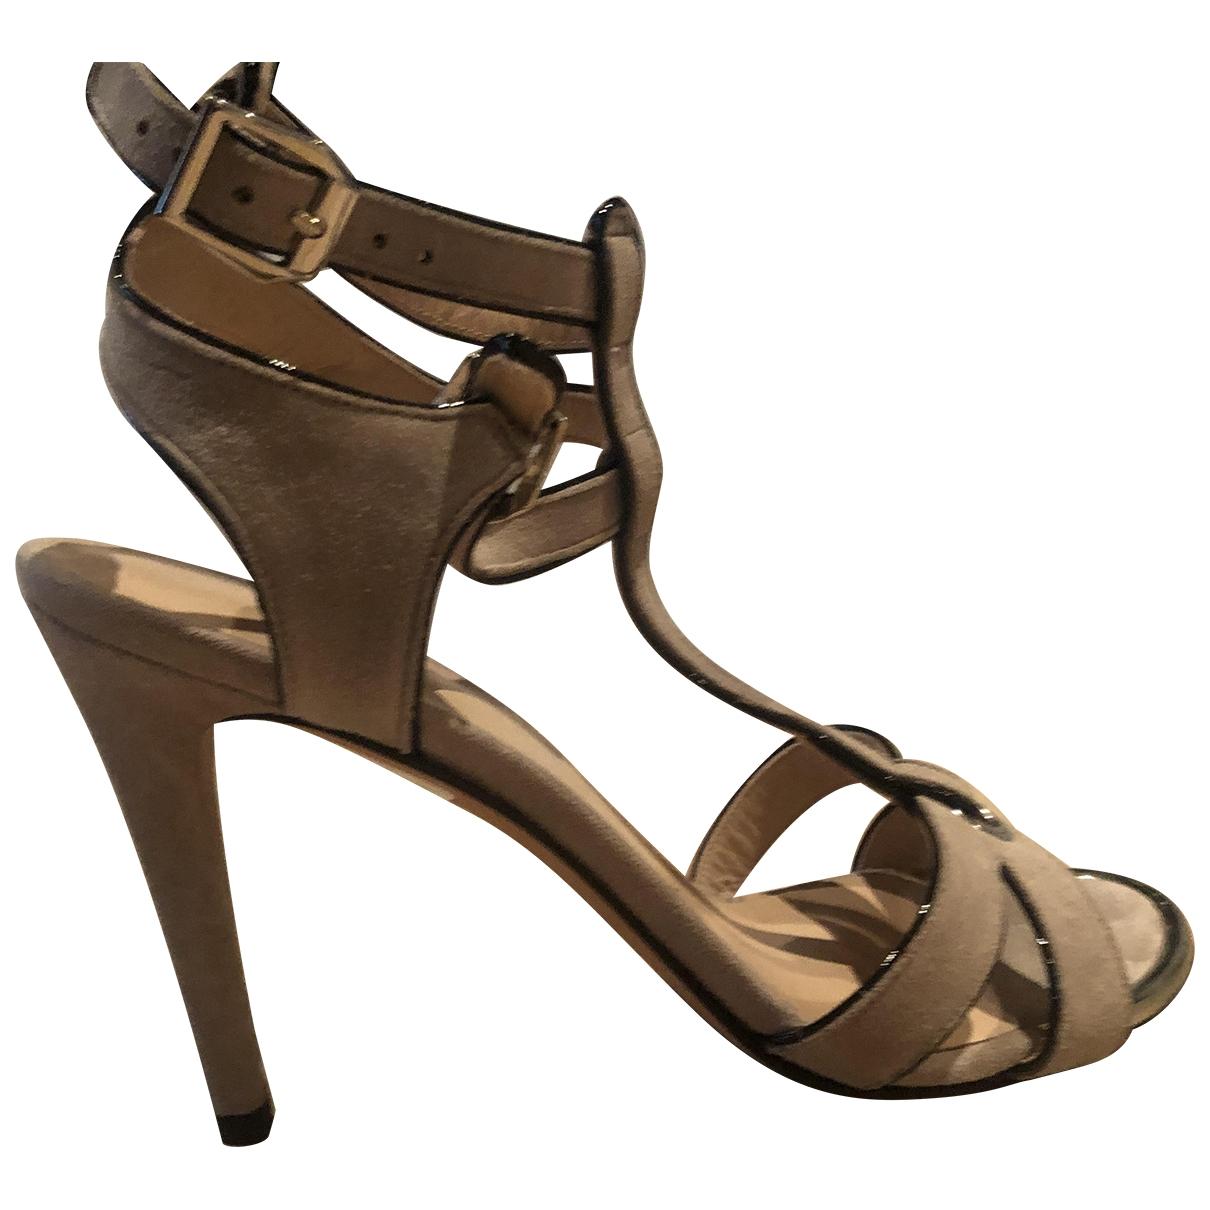 Stuart Weitzman \N Camel Leather Sandals for Women 37 EU